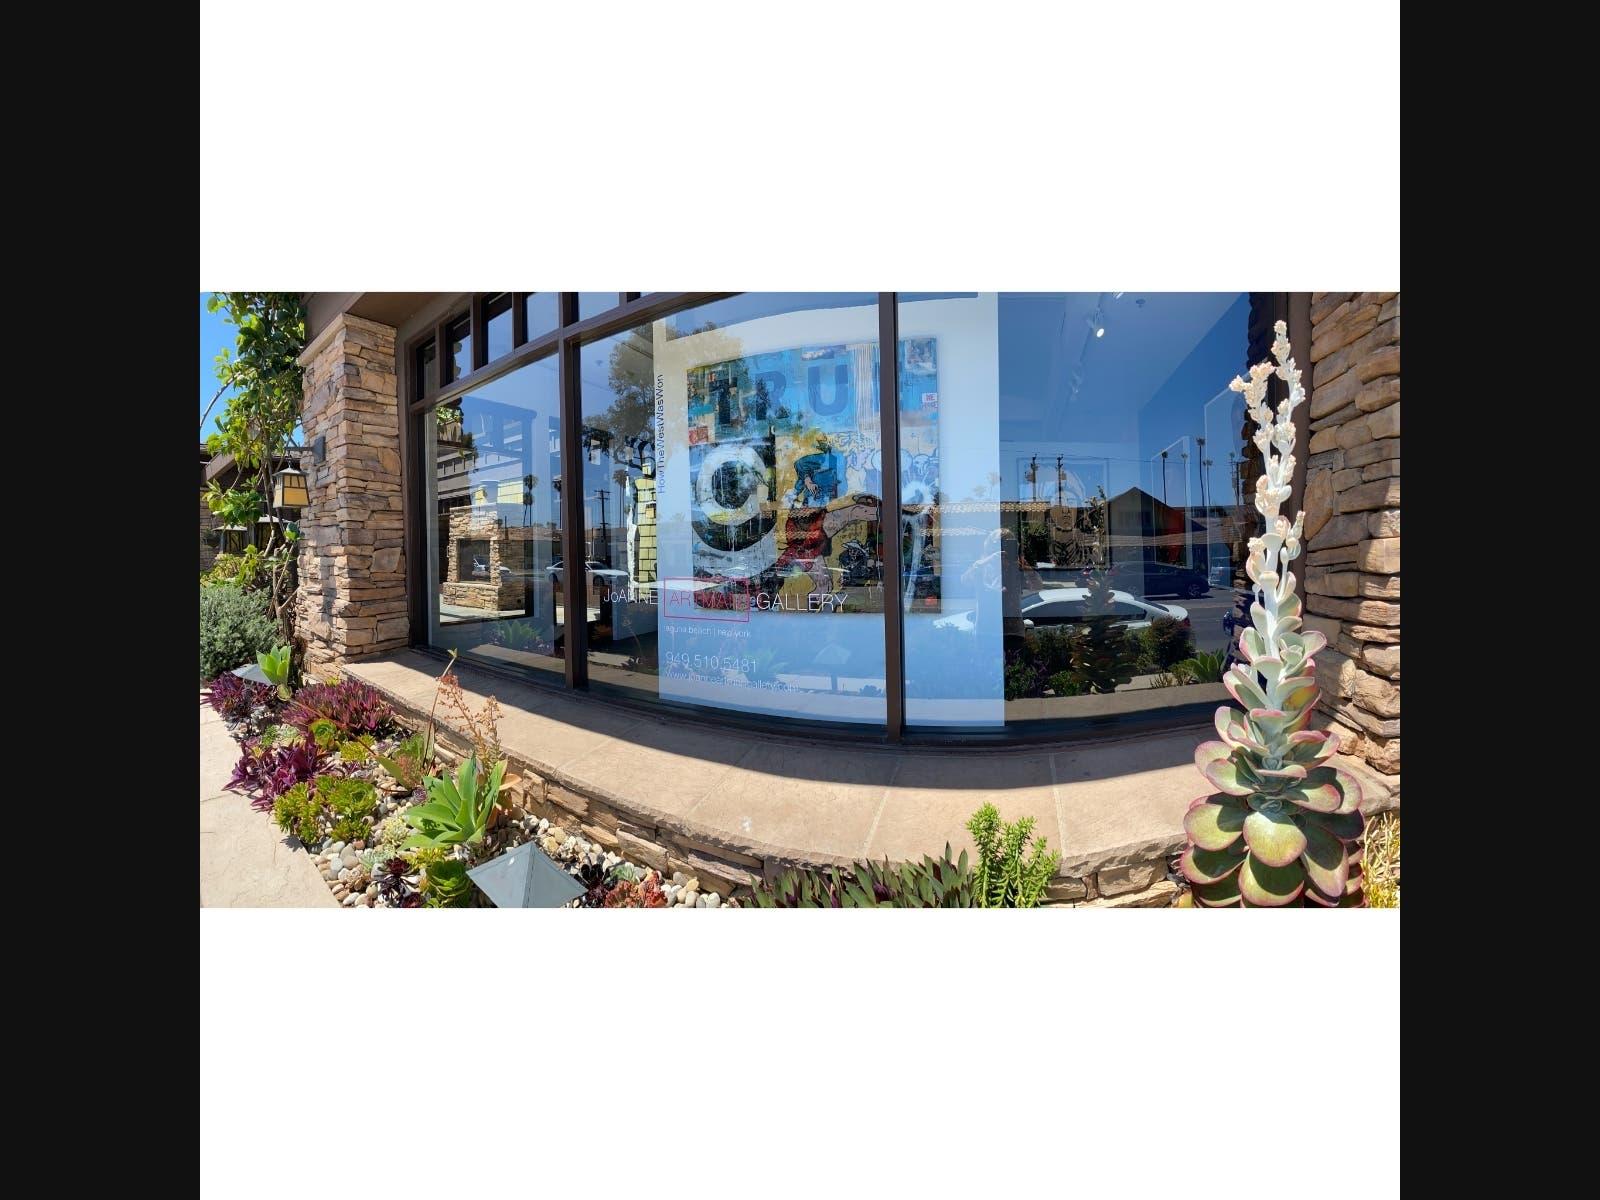 JoAnne Artman Gallery Opens 2nd Location in Laguna Beach, CA